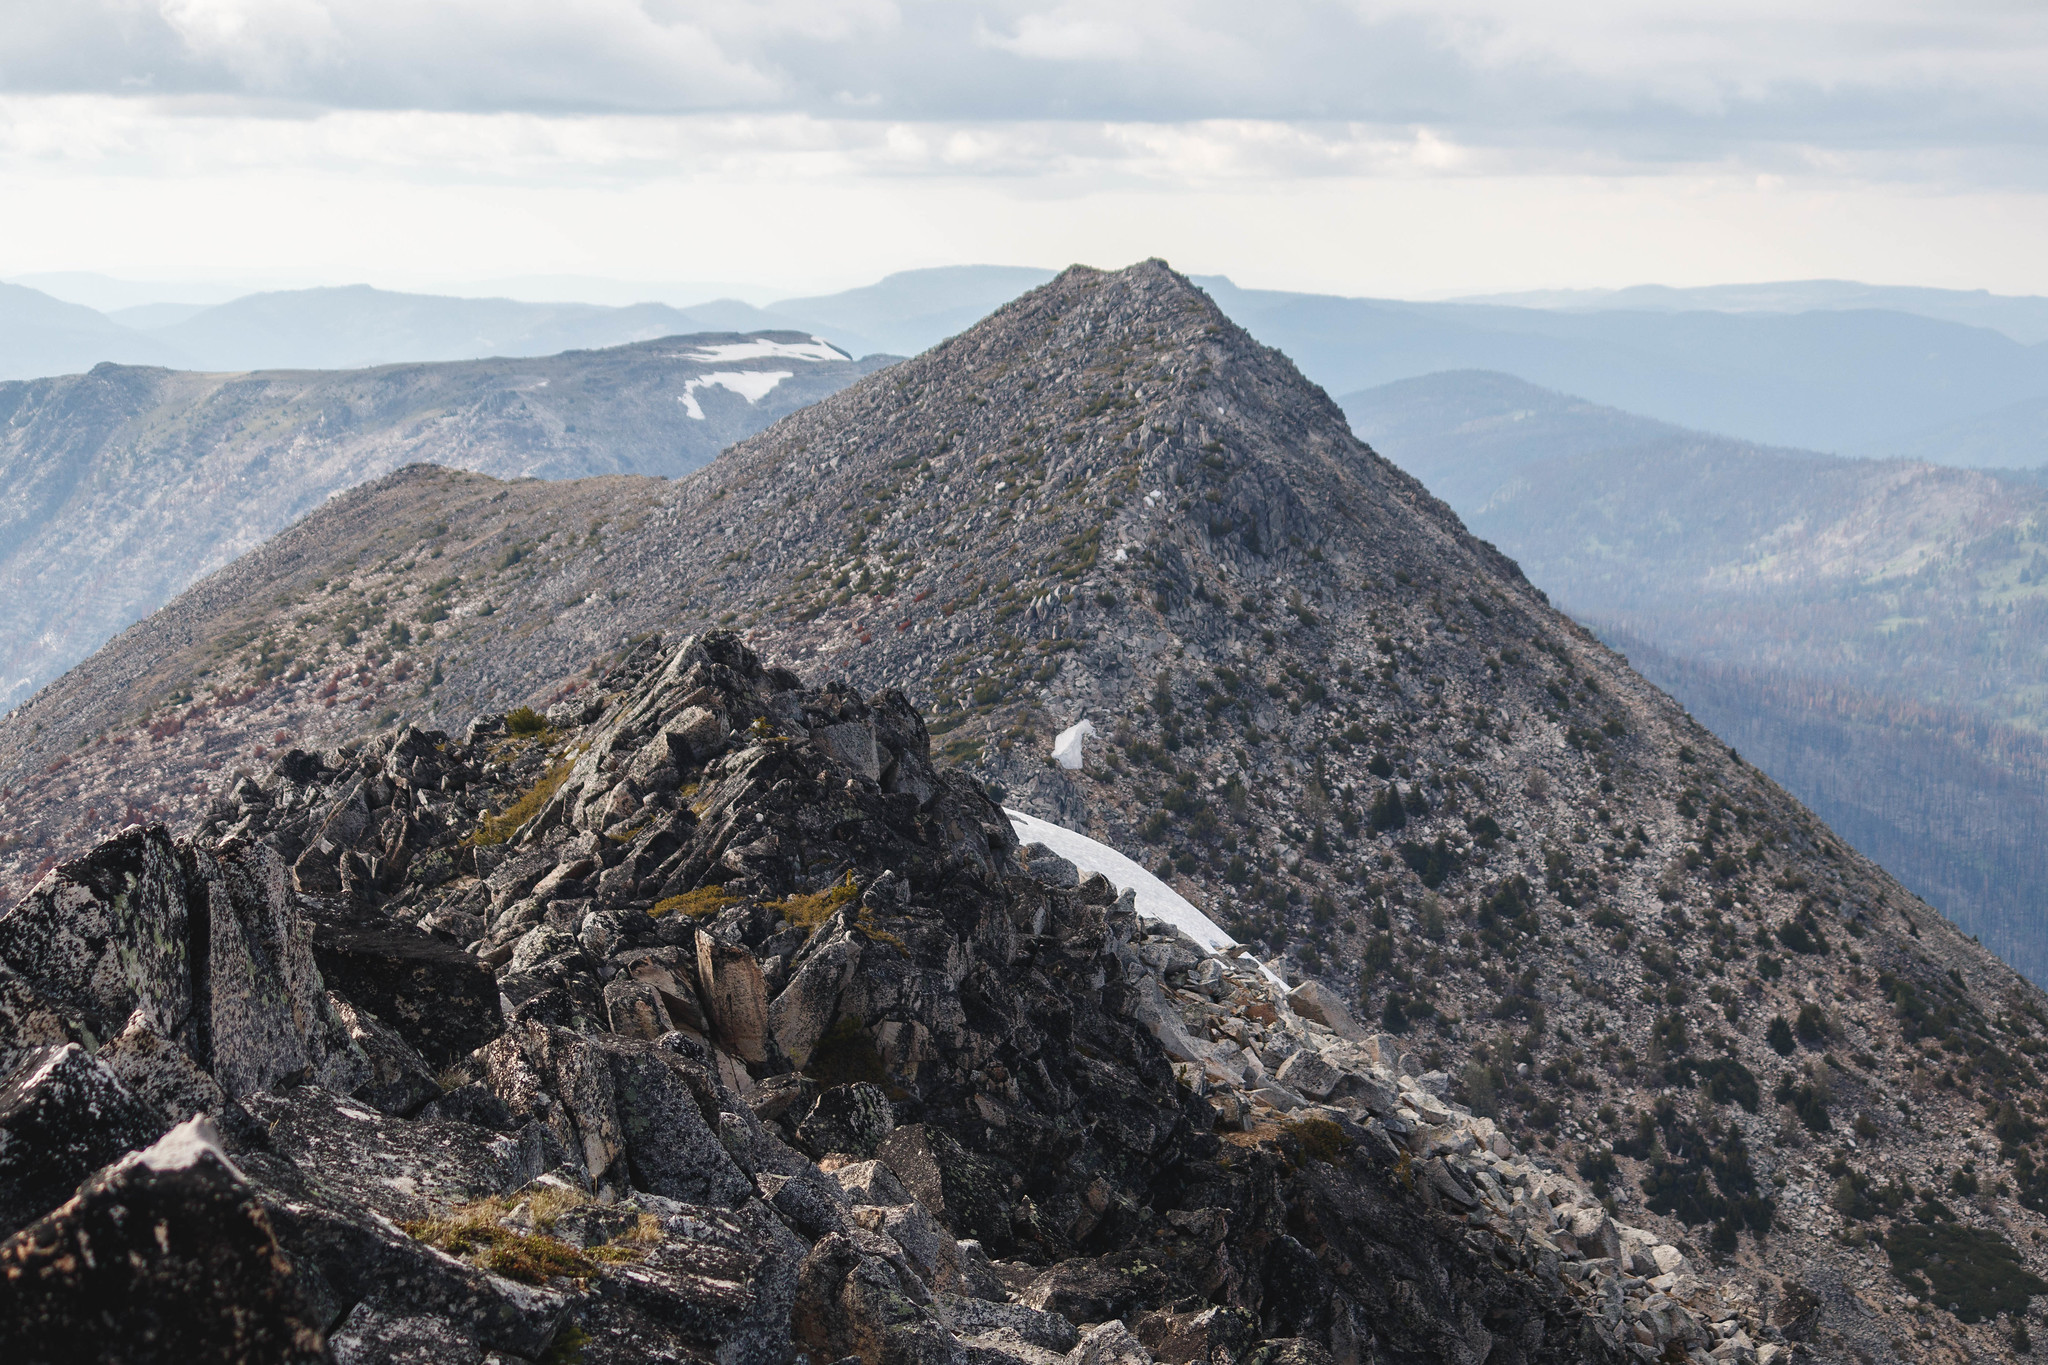 Next stop, Amos Peak